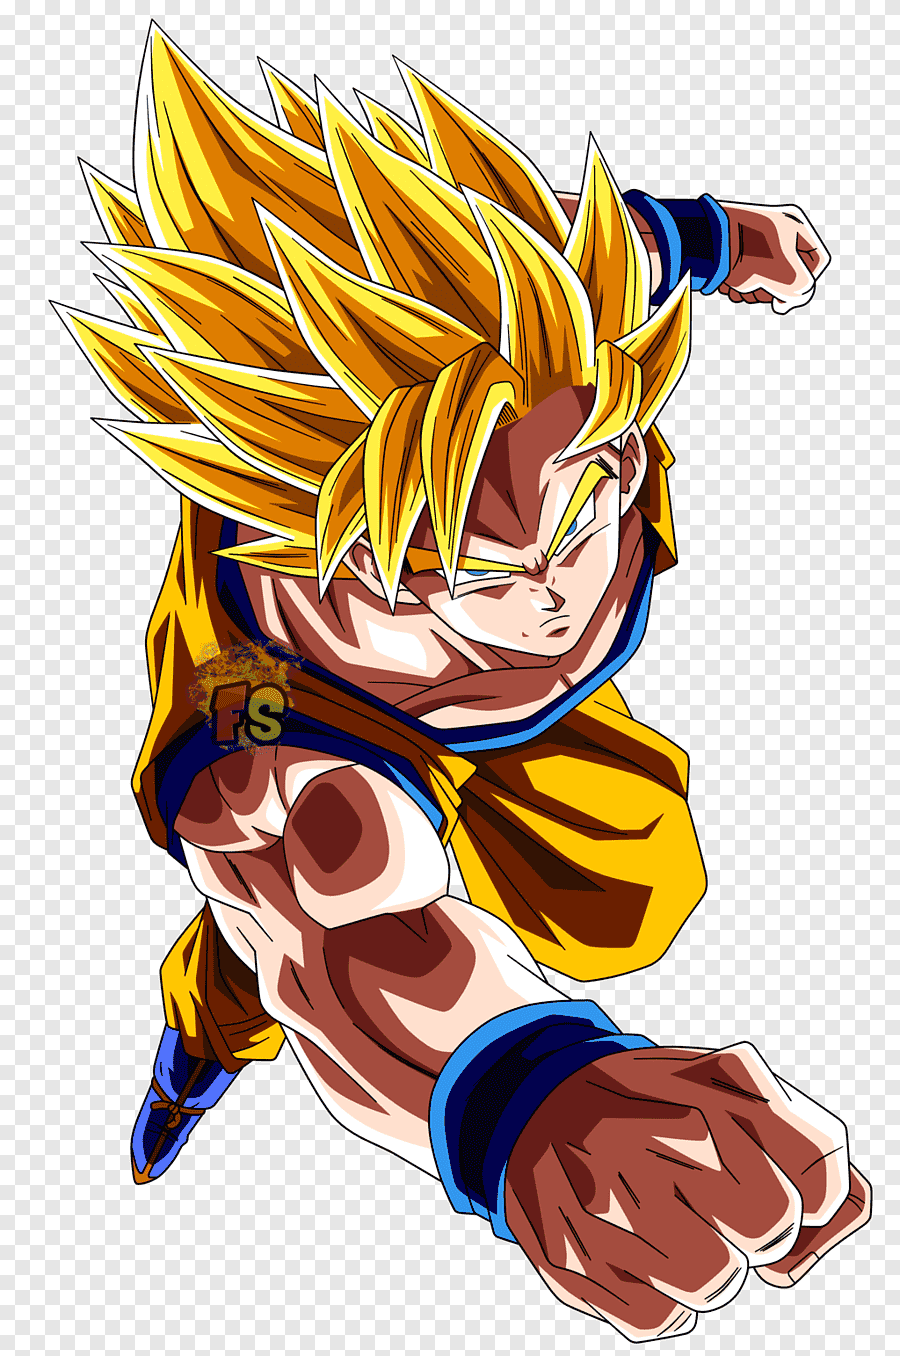 Dragon Ball Super Personnages : dragon, super, personnages, Dragon, Super, Saiyan, Guko,, Dokkan, Battle, Vegeta, Gohan, Saiya,, Ball,, Personnages, Fictifs,, Super-héros, PNGEgg